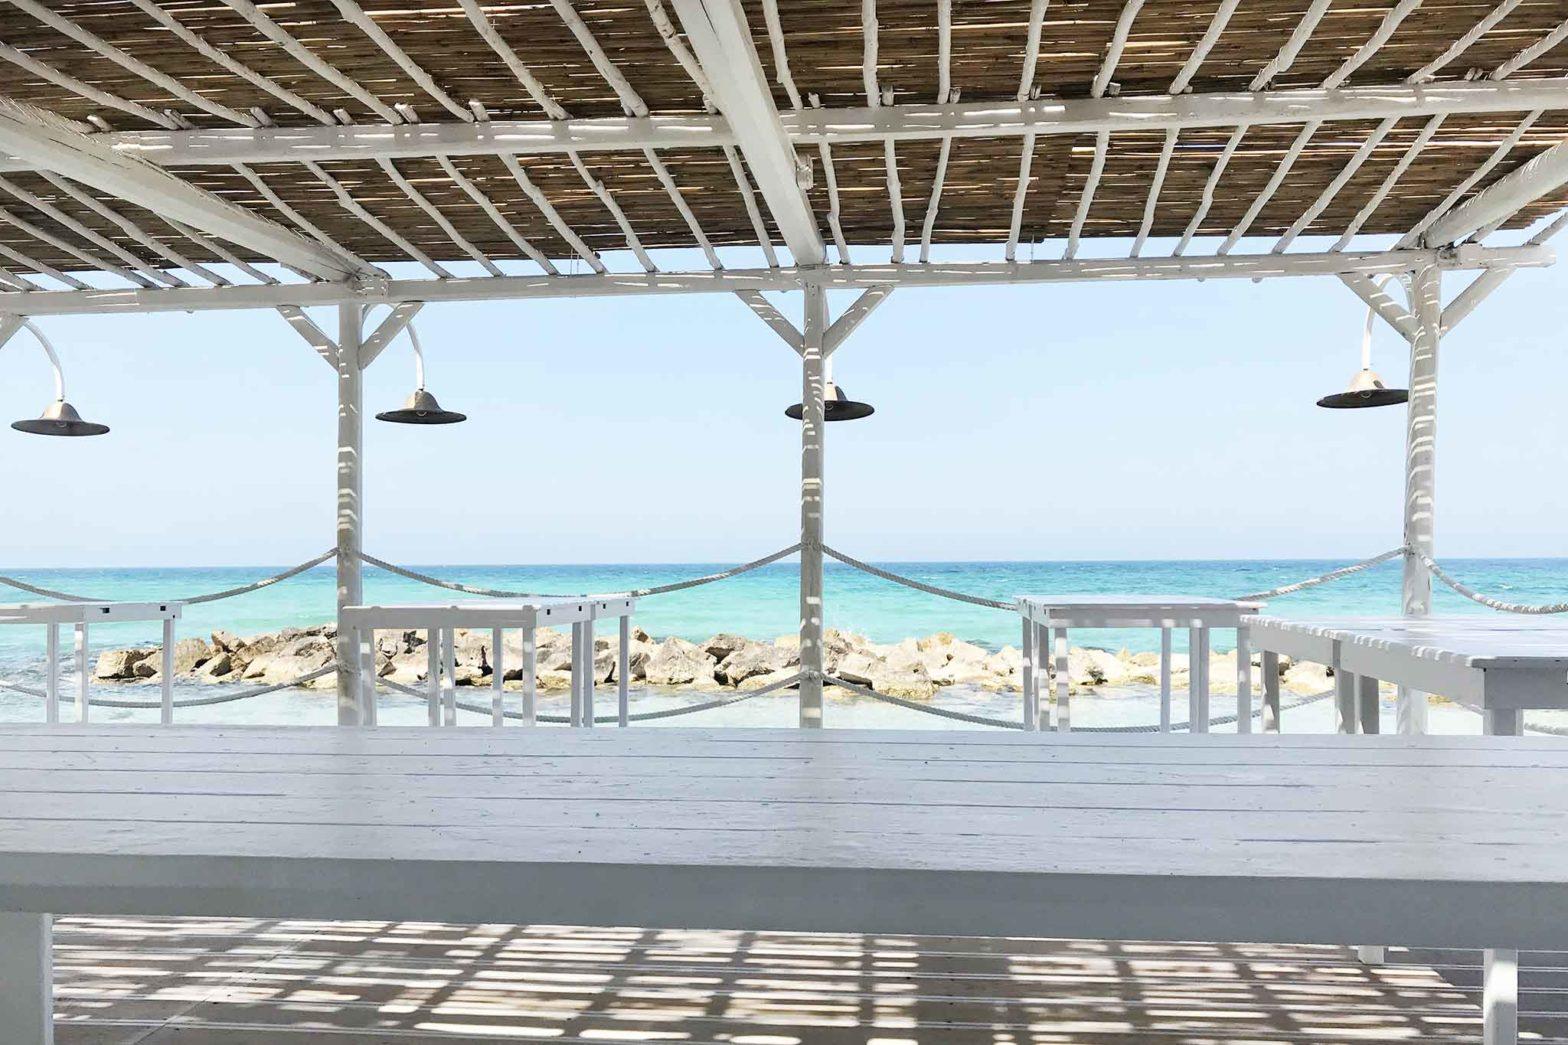 ristorante tavoli aperto mare